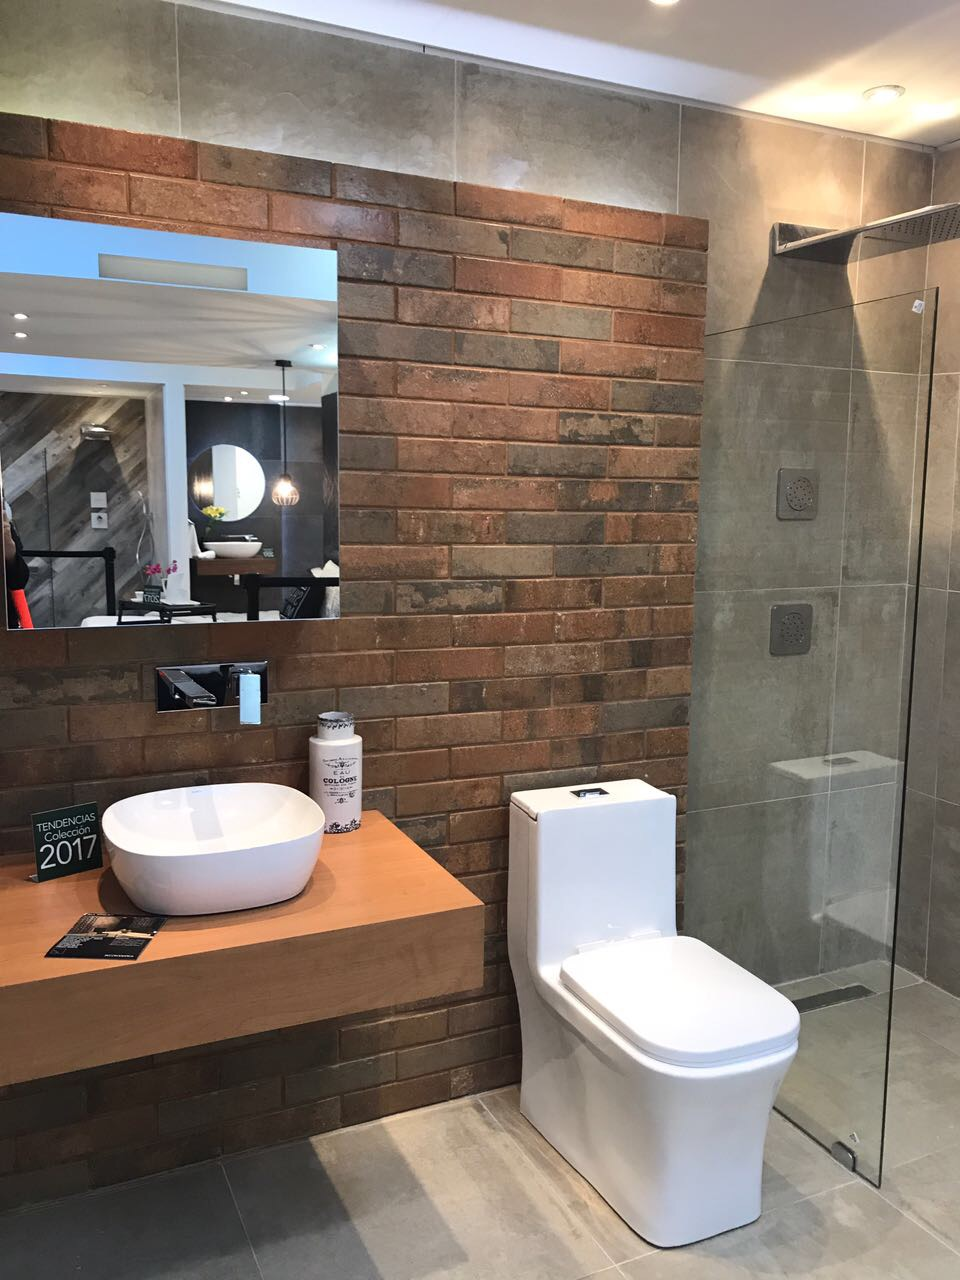 diseño de baño textura moderno innovación innovacion ducha espejo